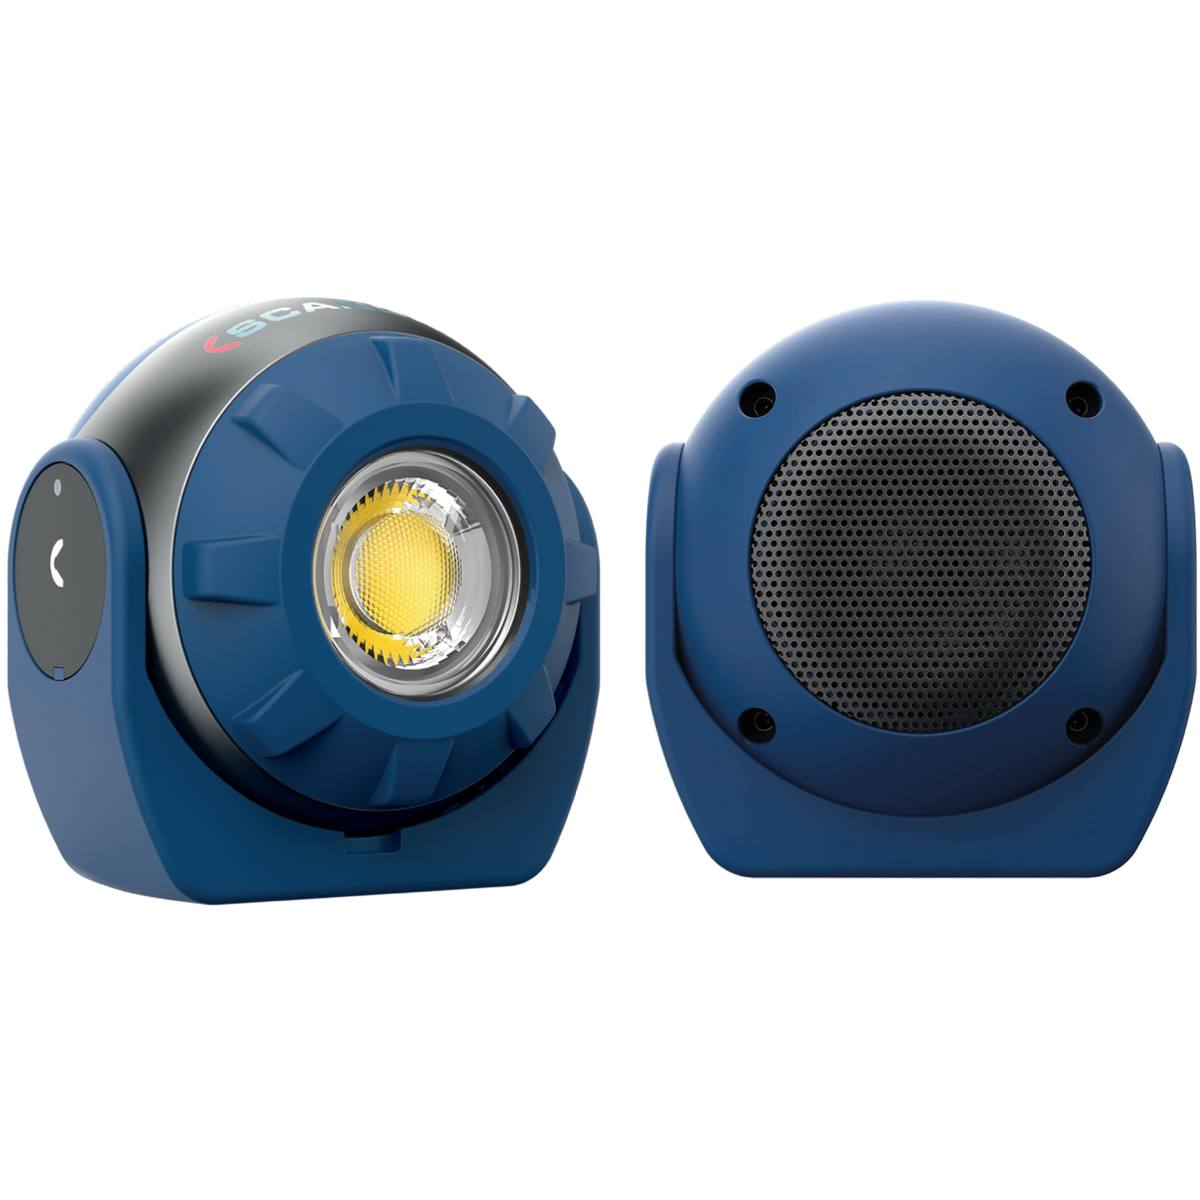 LAMPE AUDIO SOUND LED S  5W 600LM